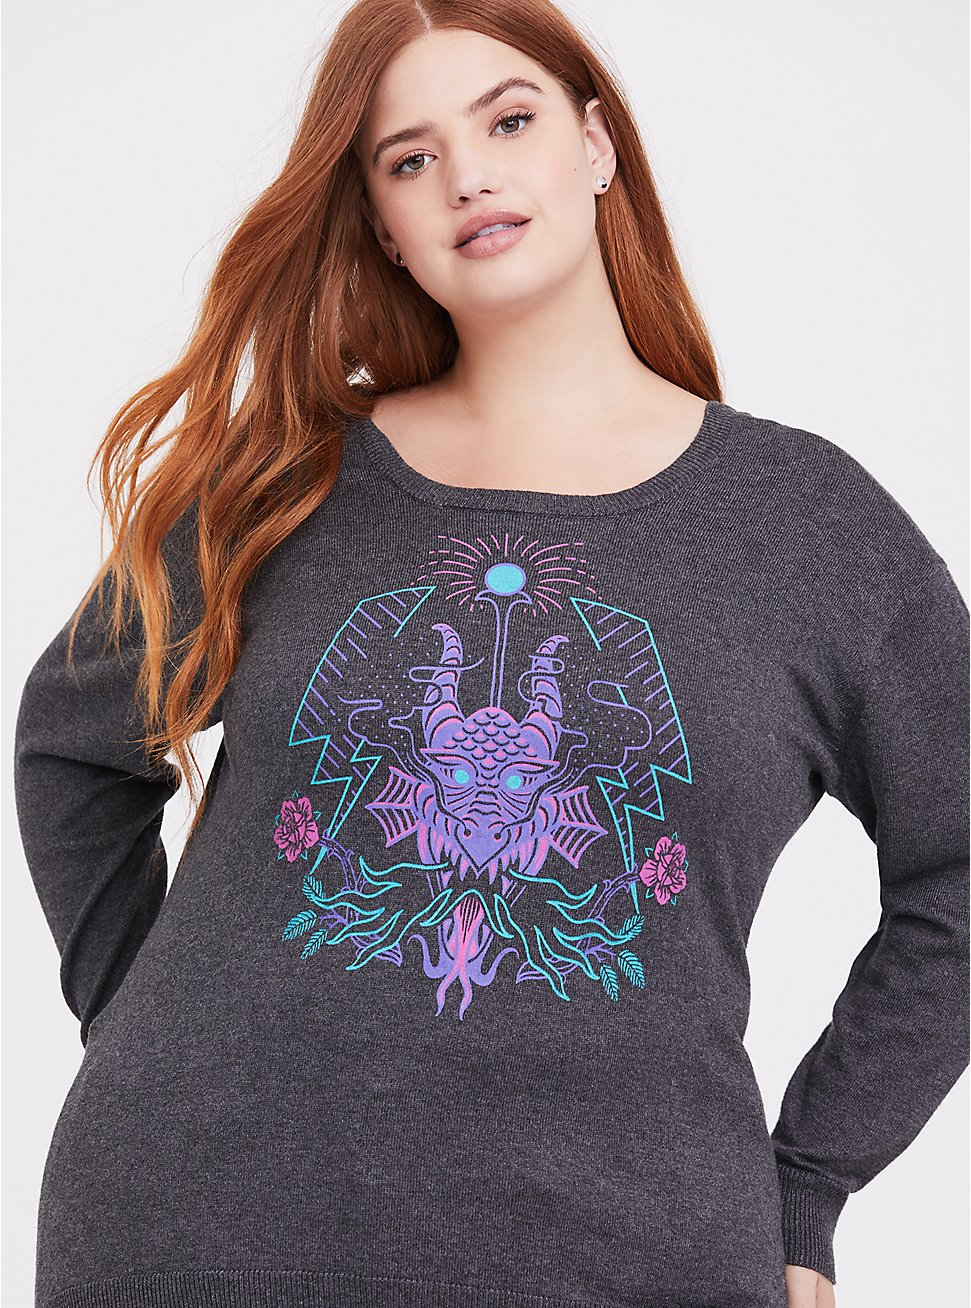 Plus Size Disney Villains Maleficent Grey Sweater-knit Crisscross Back Top, , hi-res